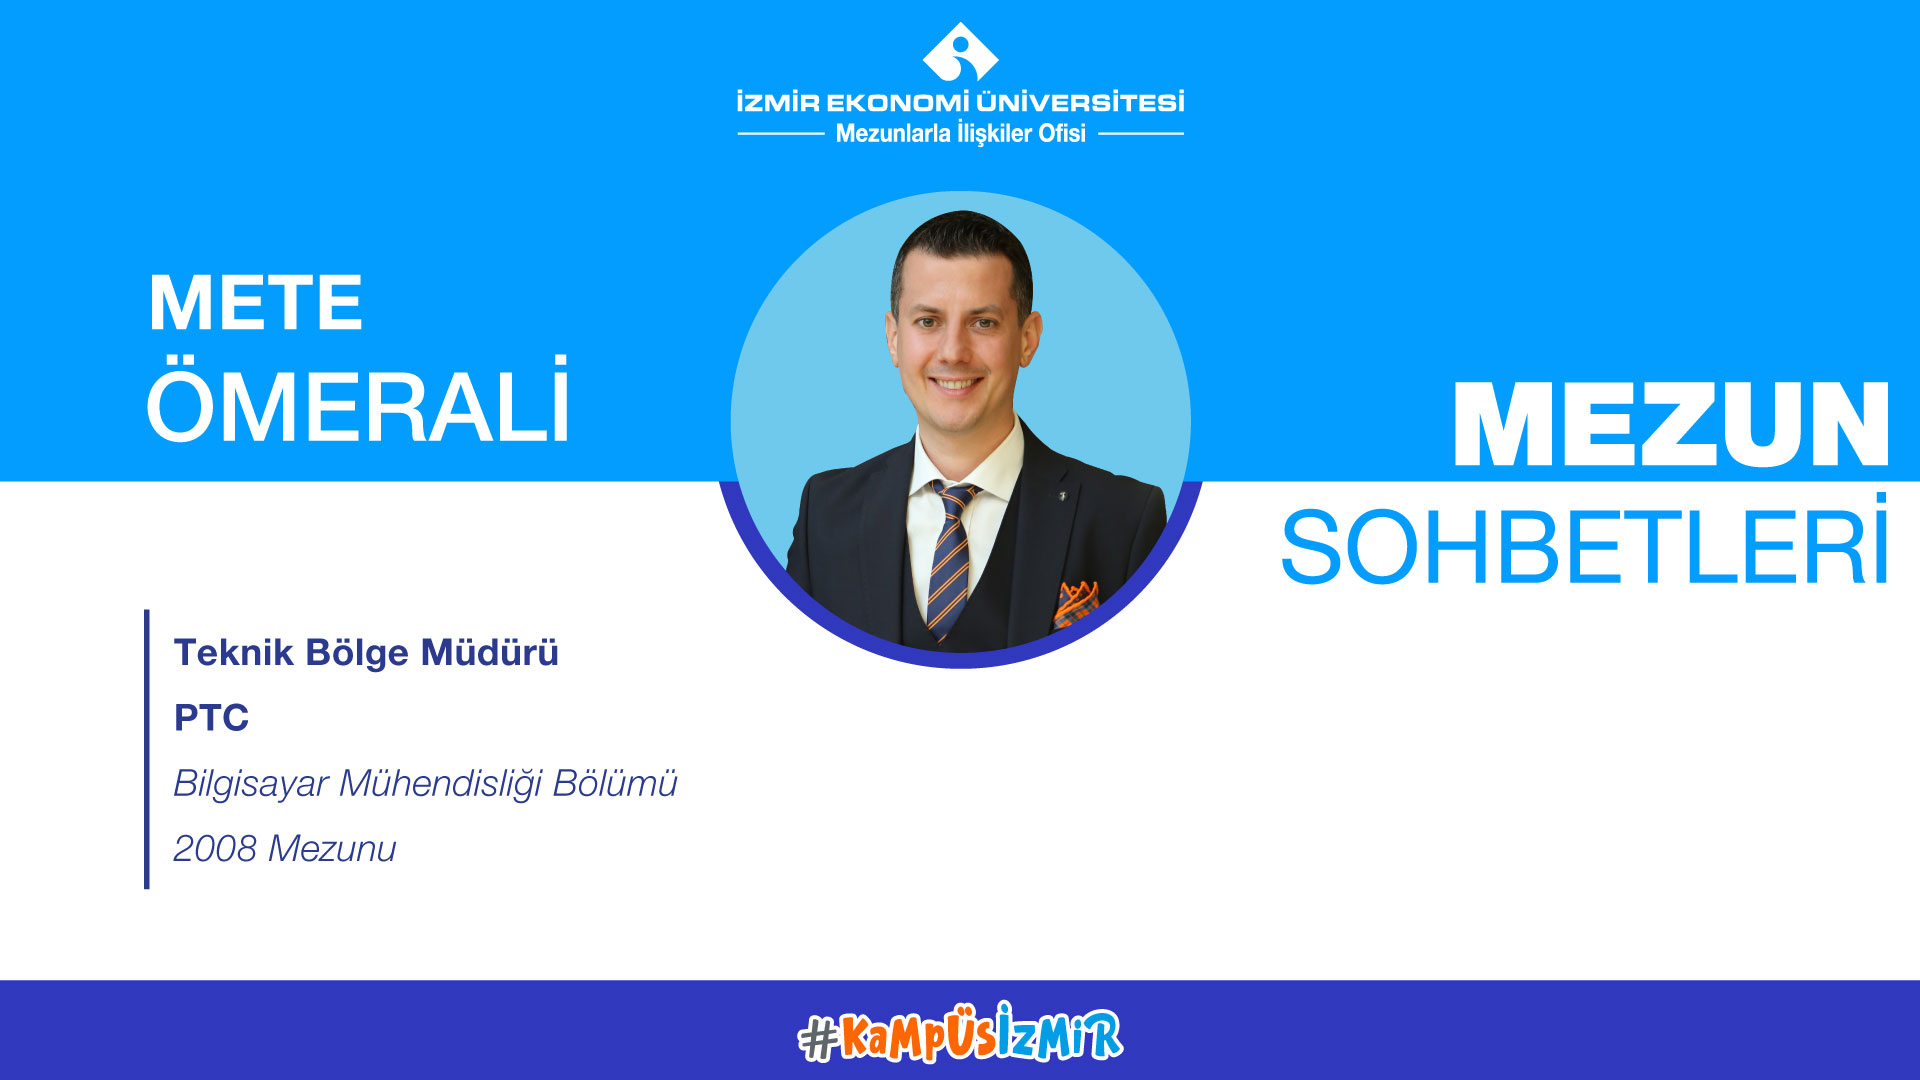 Online alumni chats-Mete Ömerali